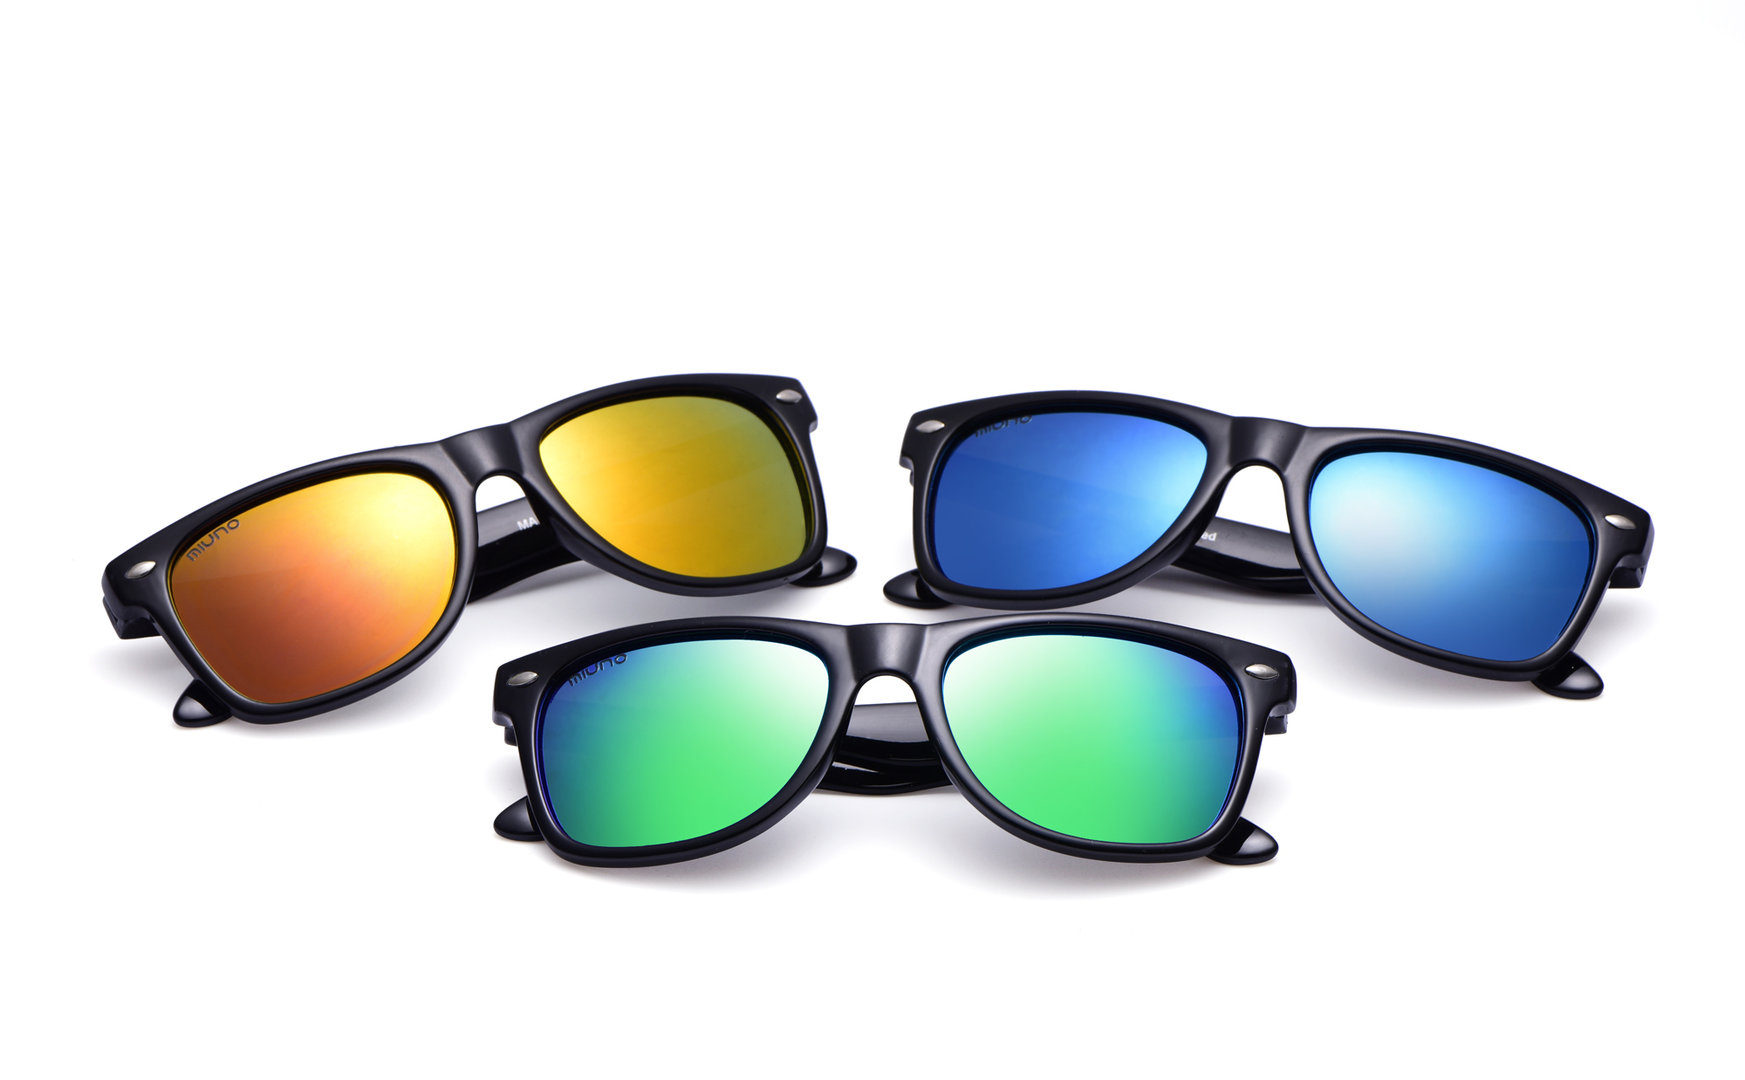 miuno kinder sonnenbrille polarisiert polarized wayfare. Black Bedroom Furniture Sets. Home Design Ideas